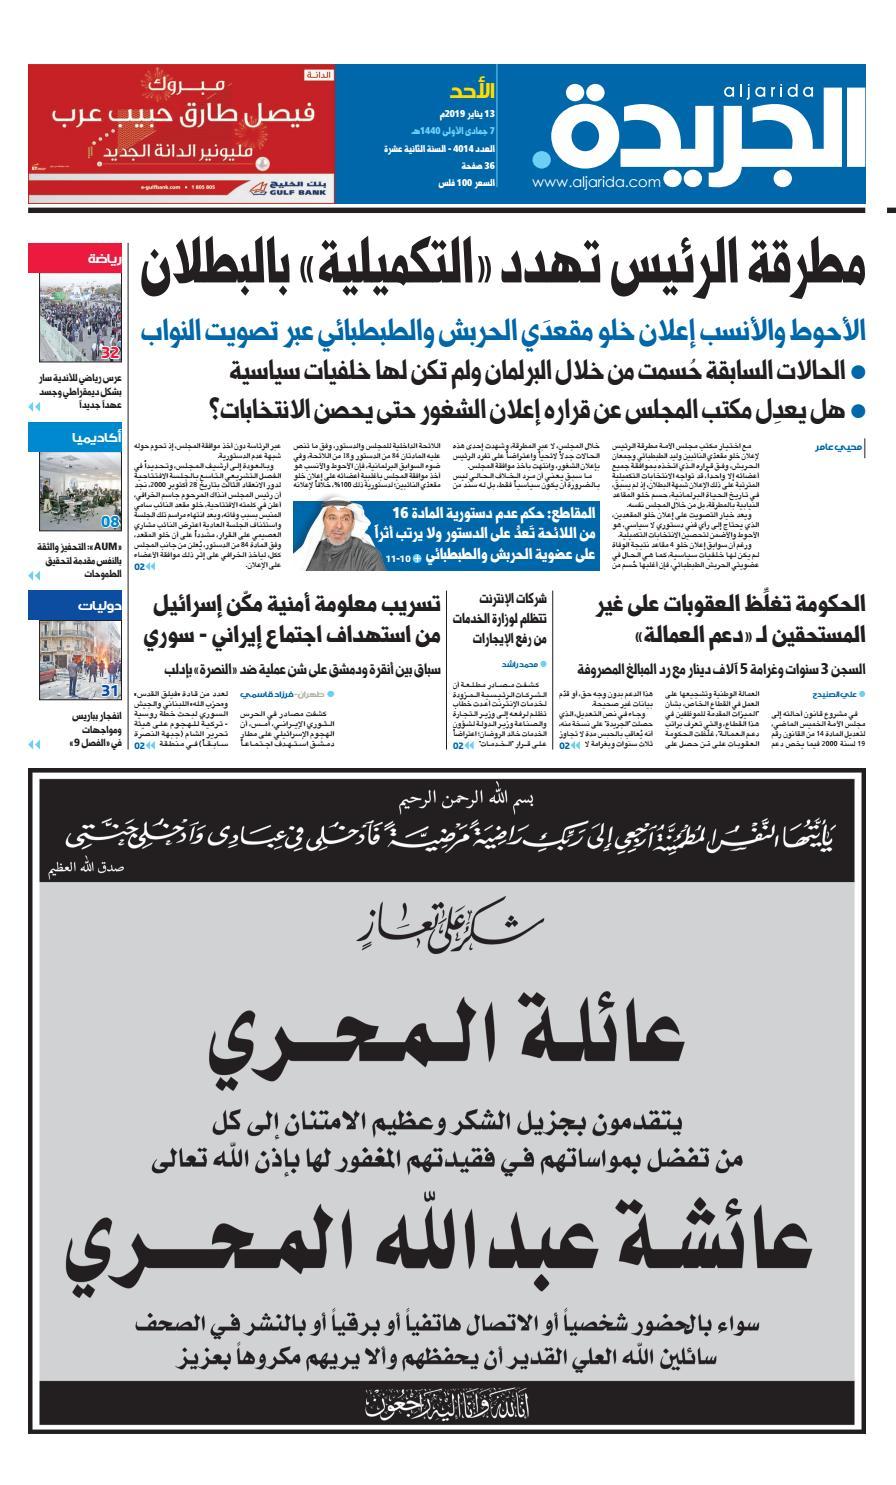 b9b905197 عدد الجريدة الأحد 13 يناير 2019 by Aljarida Newspaper - issuu